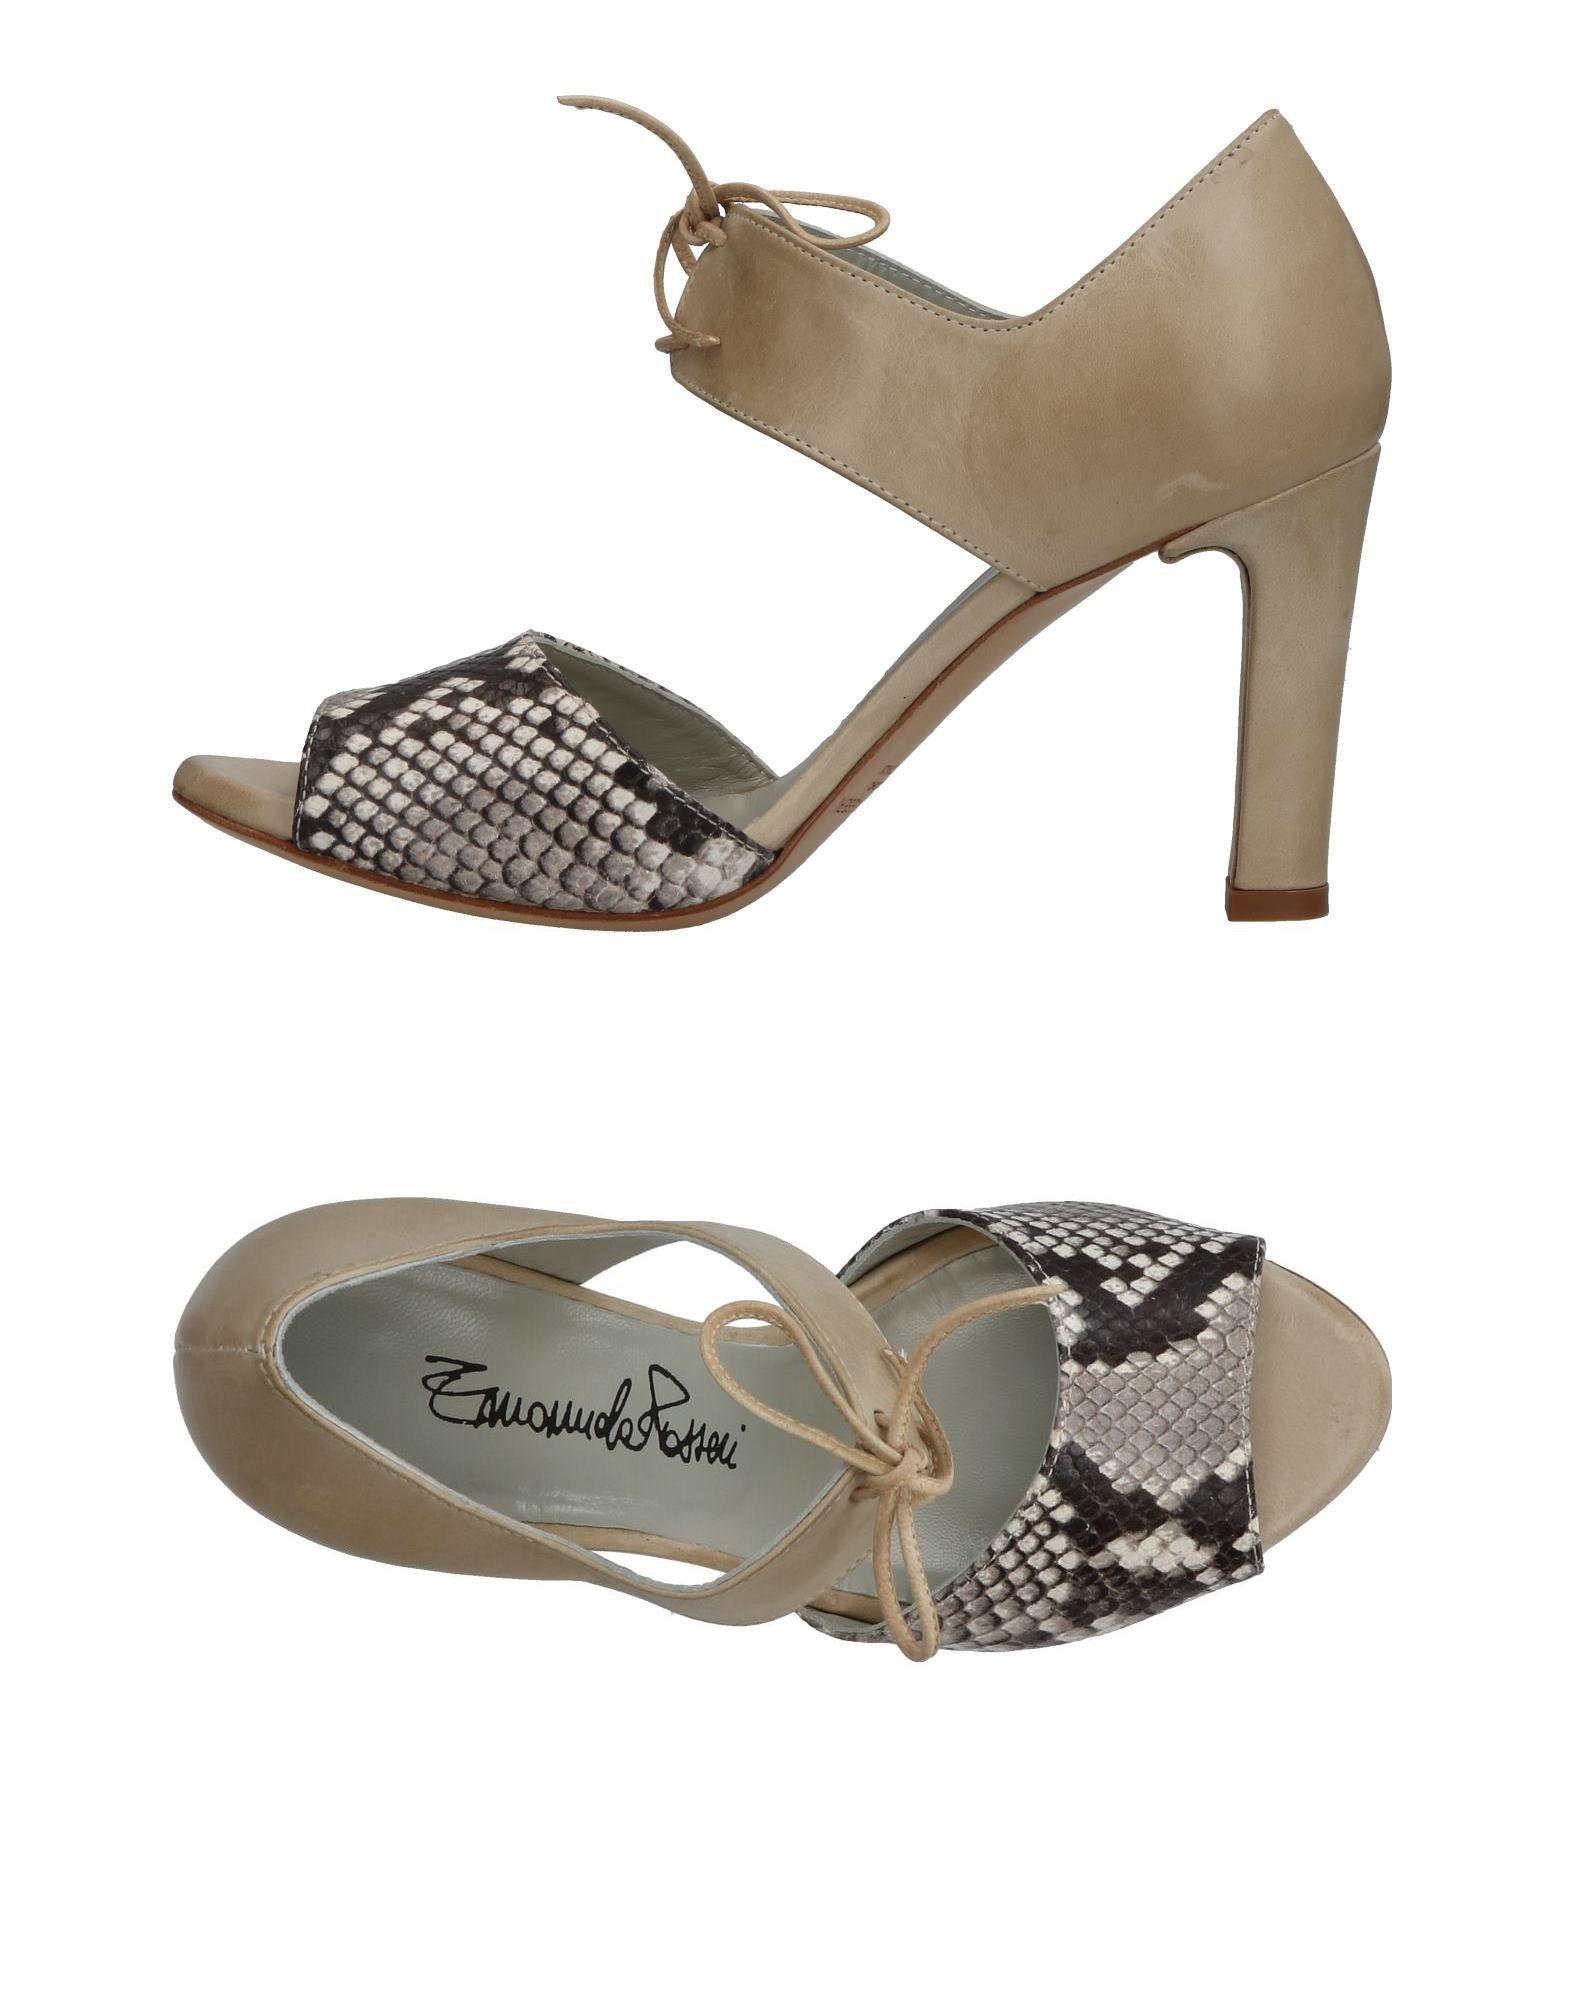 Emanuela Passeri Sandalen Damen  11331627CG Gute Qualität beliebte Schuhe